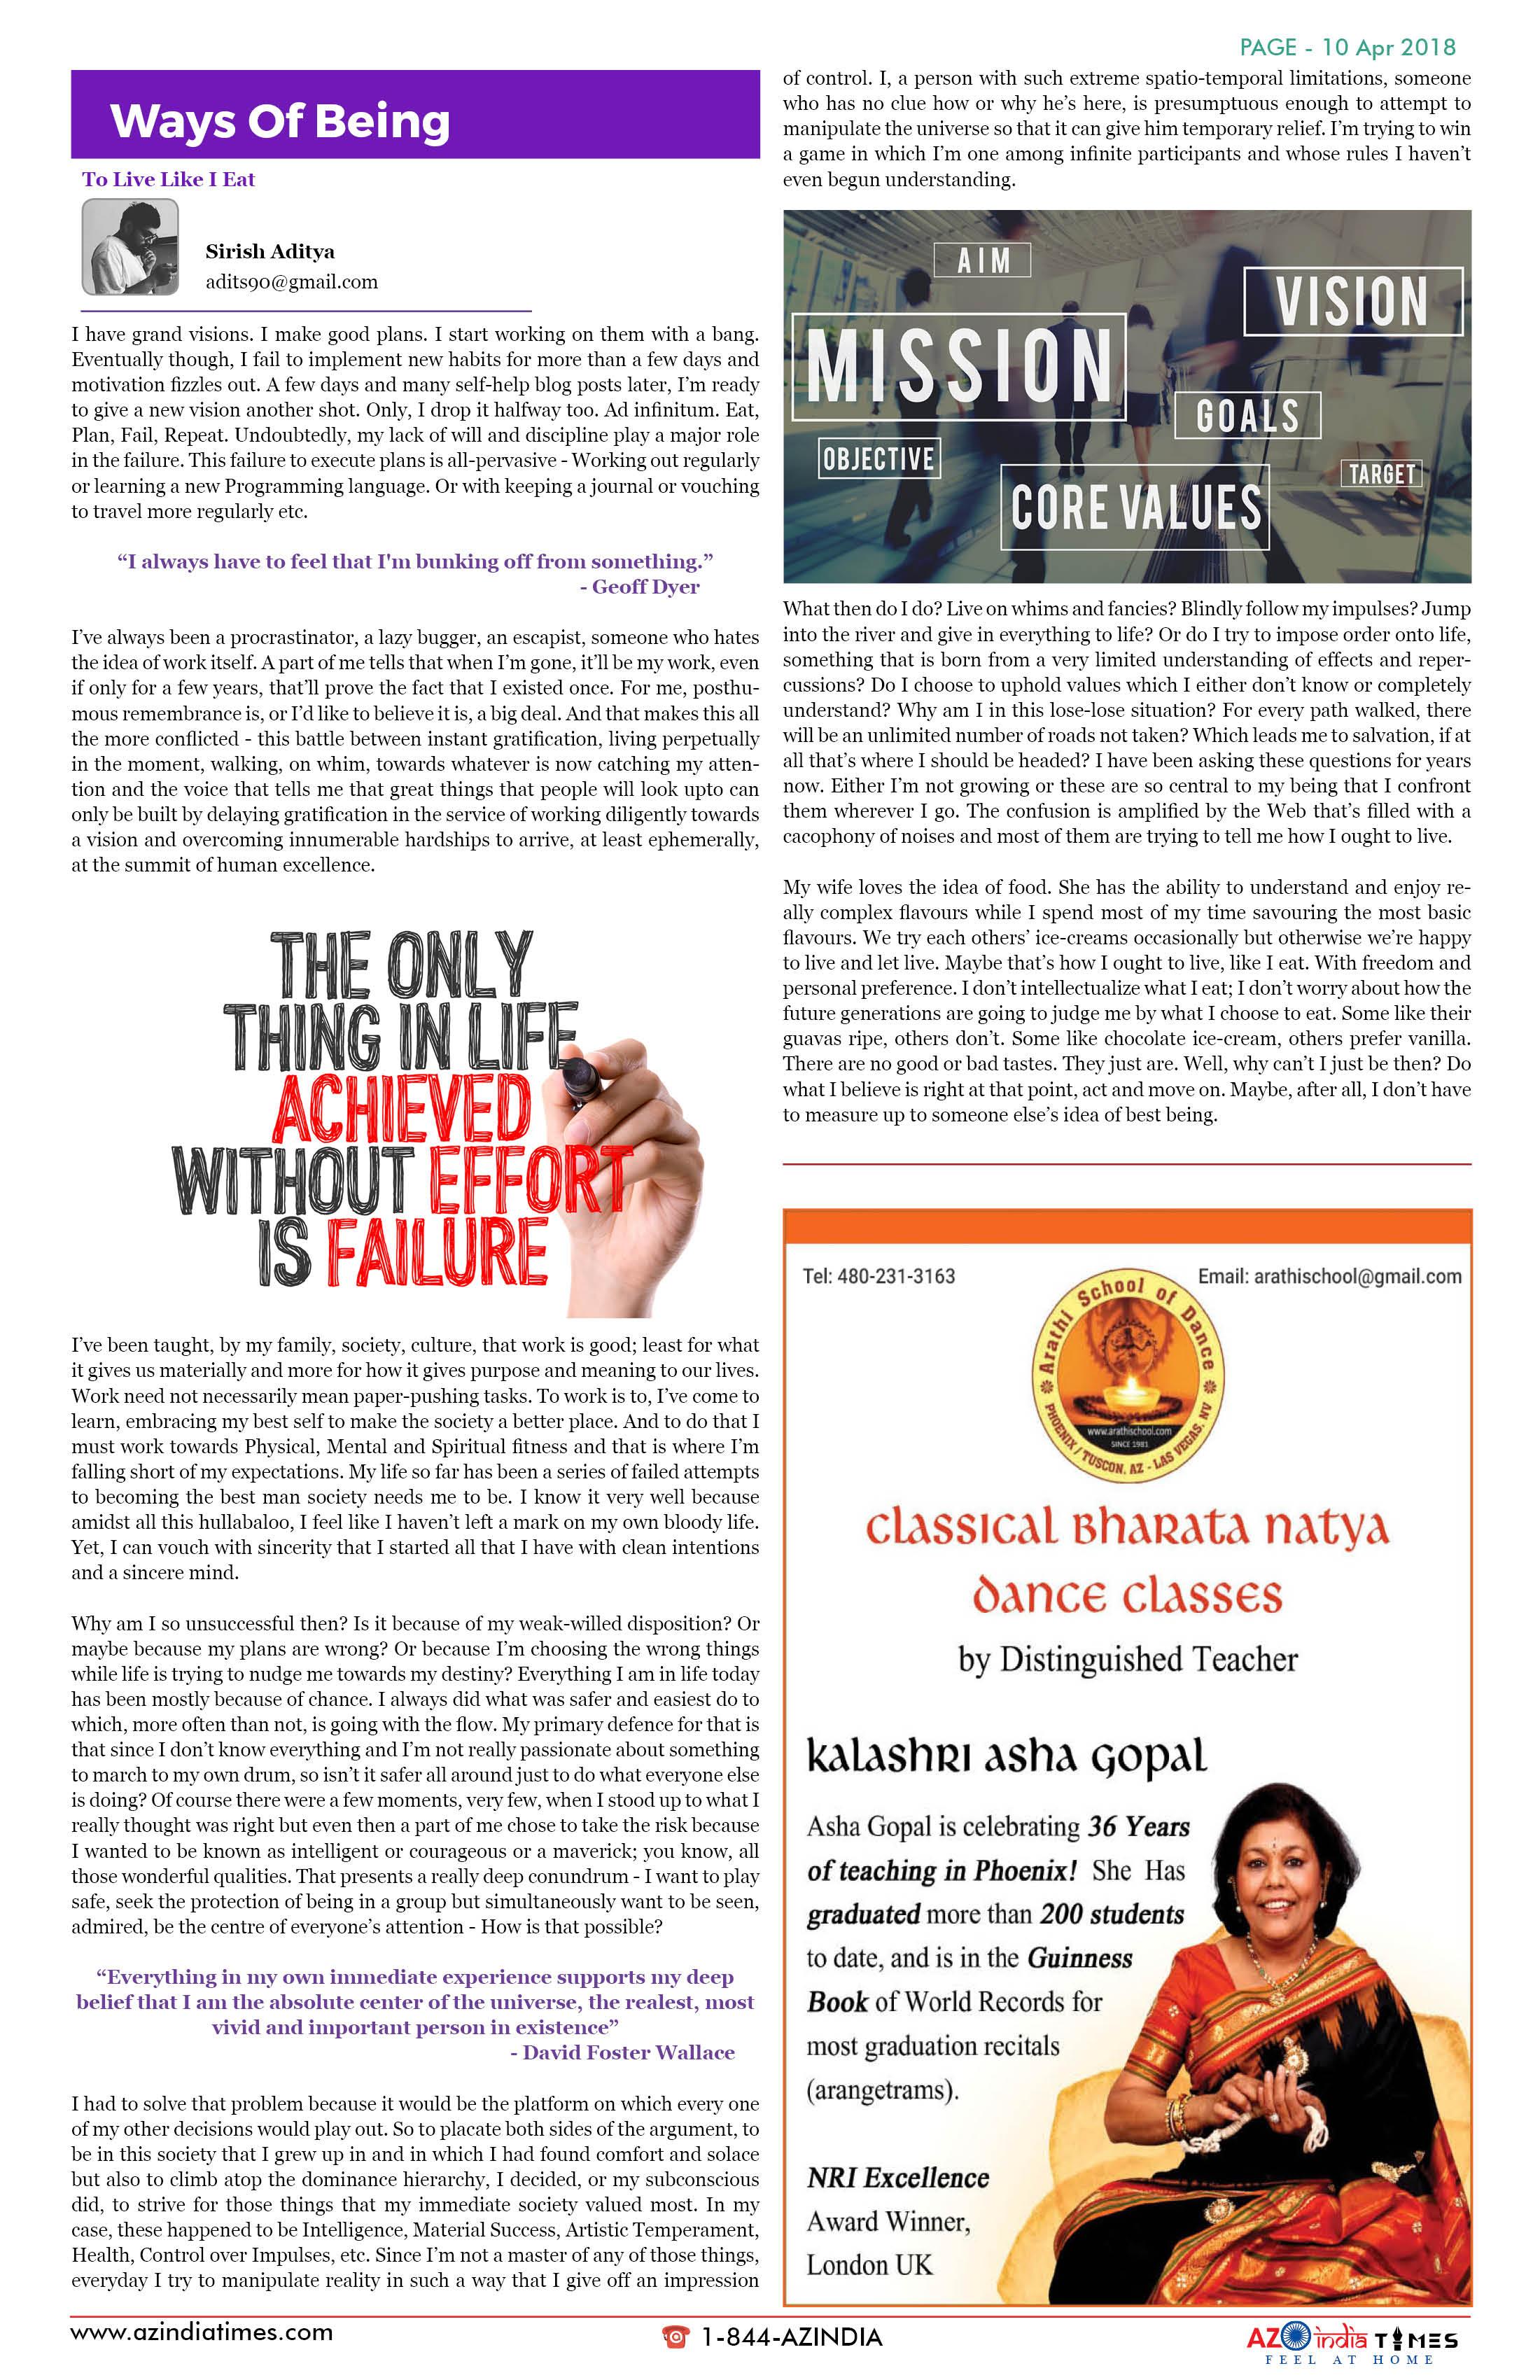 AZ INDIA APRIL EDITION 10